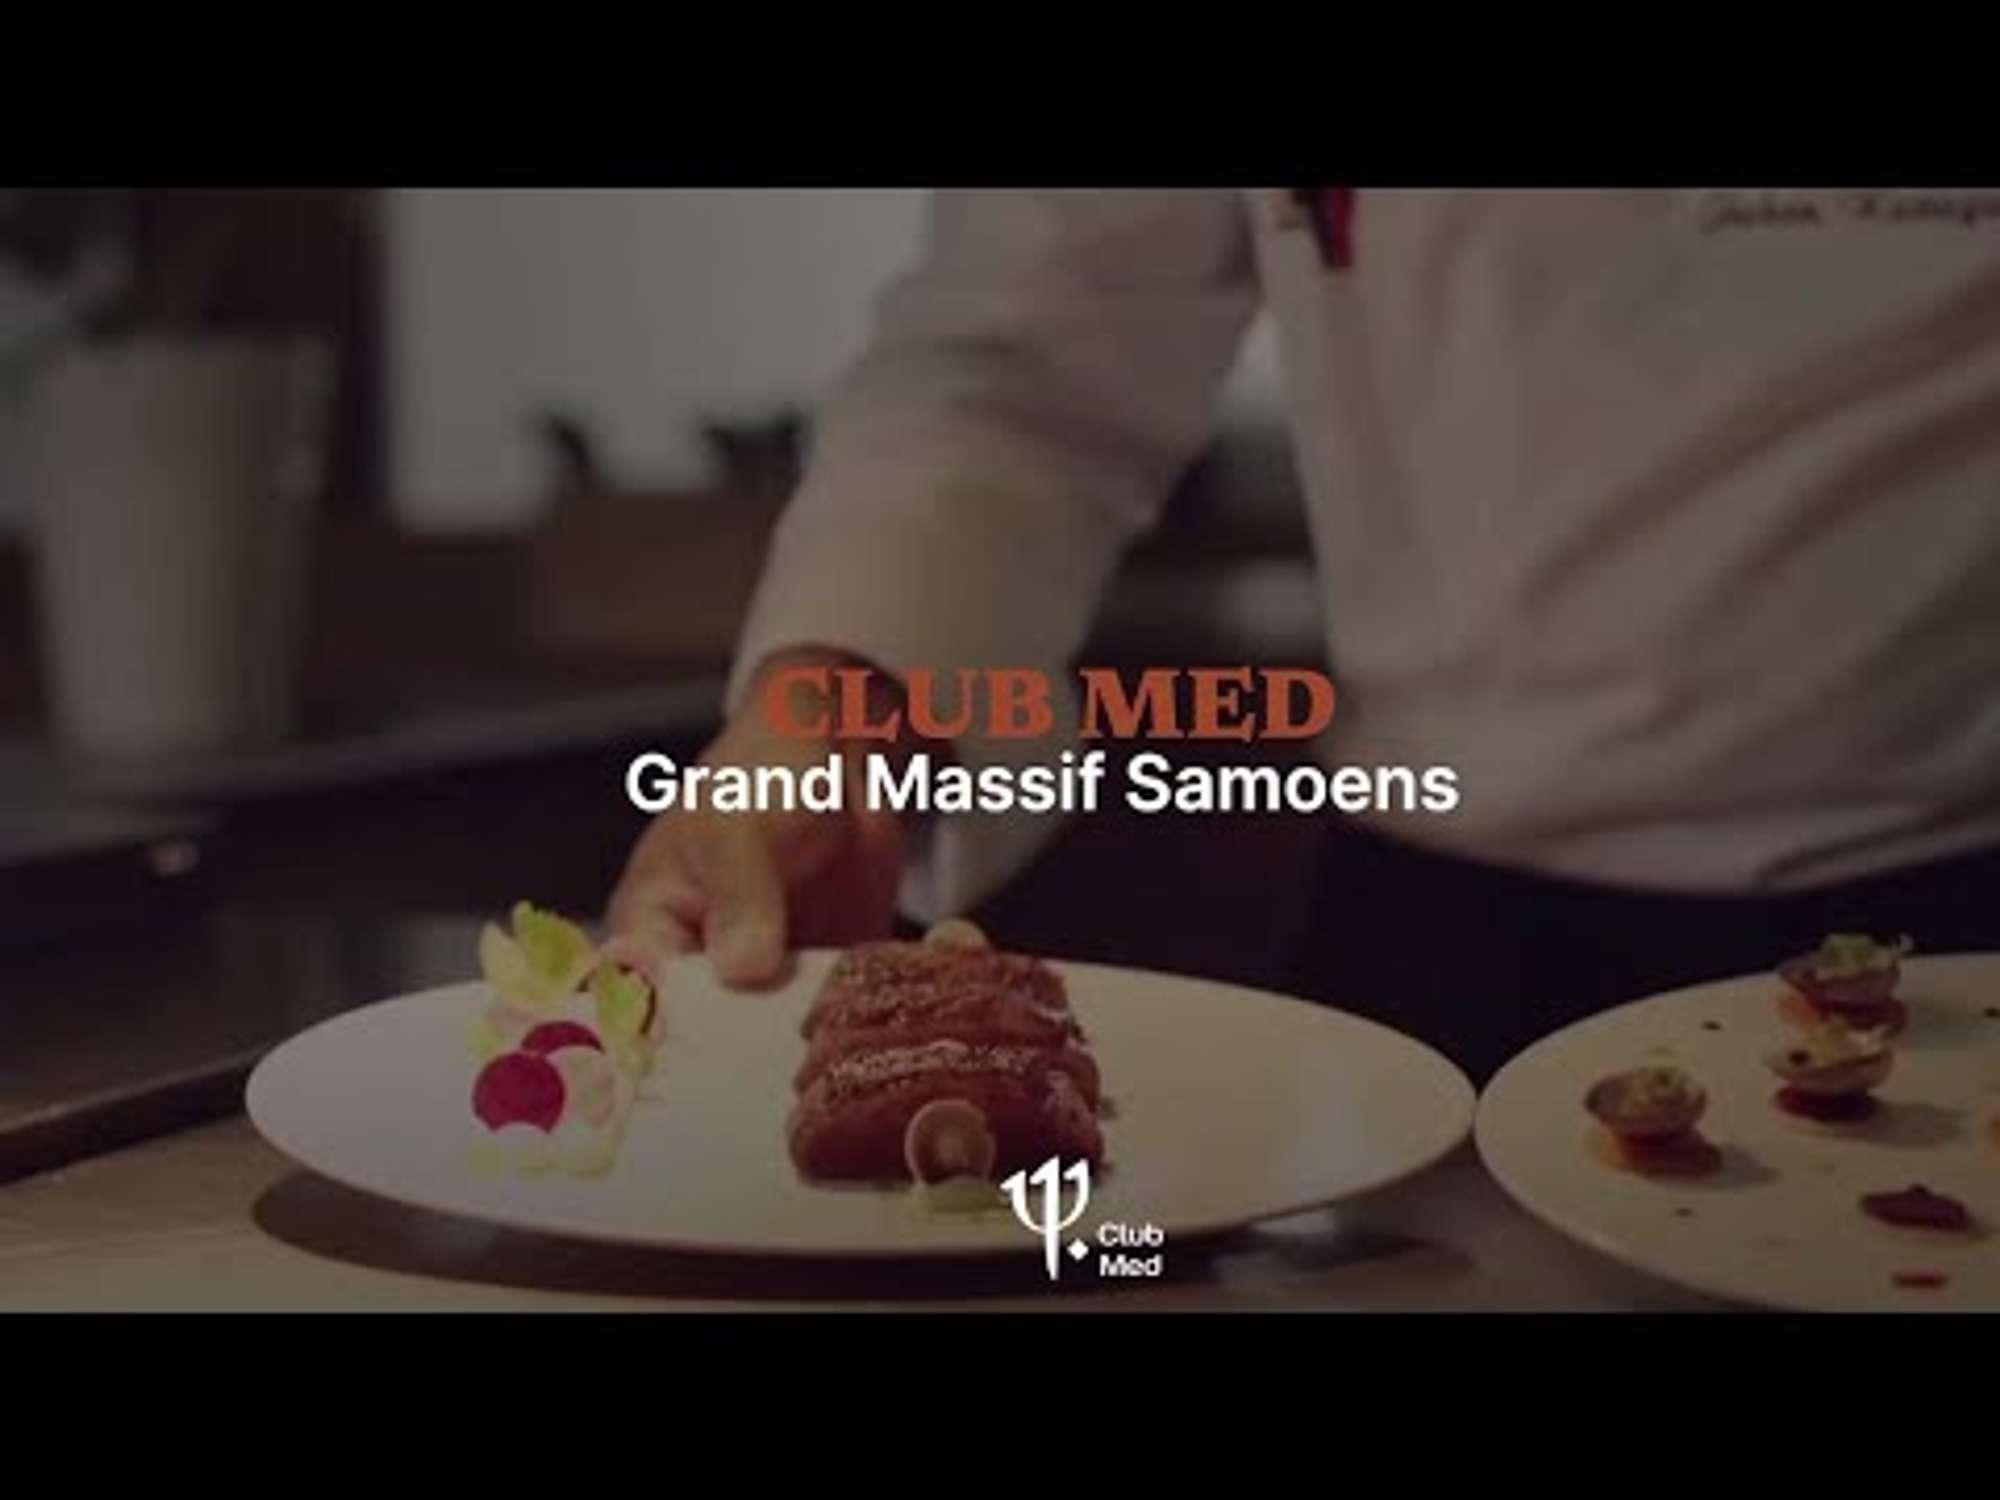 Open Grand Massif Samoëns Morillon וידיאו slideshow gallery at 1